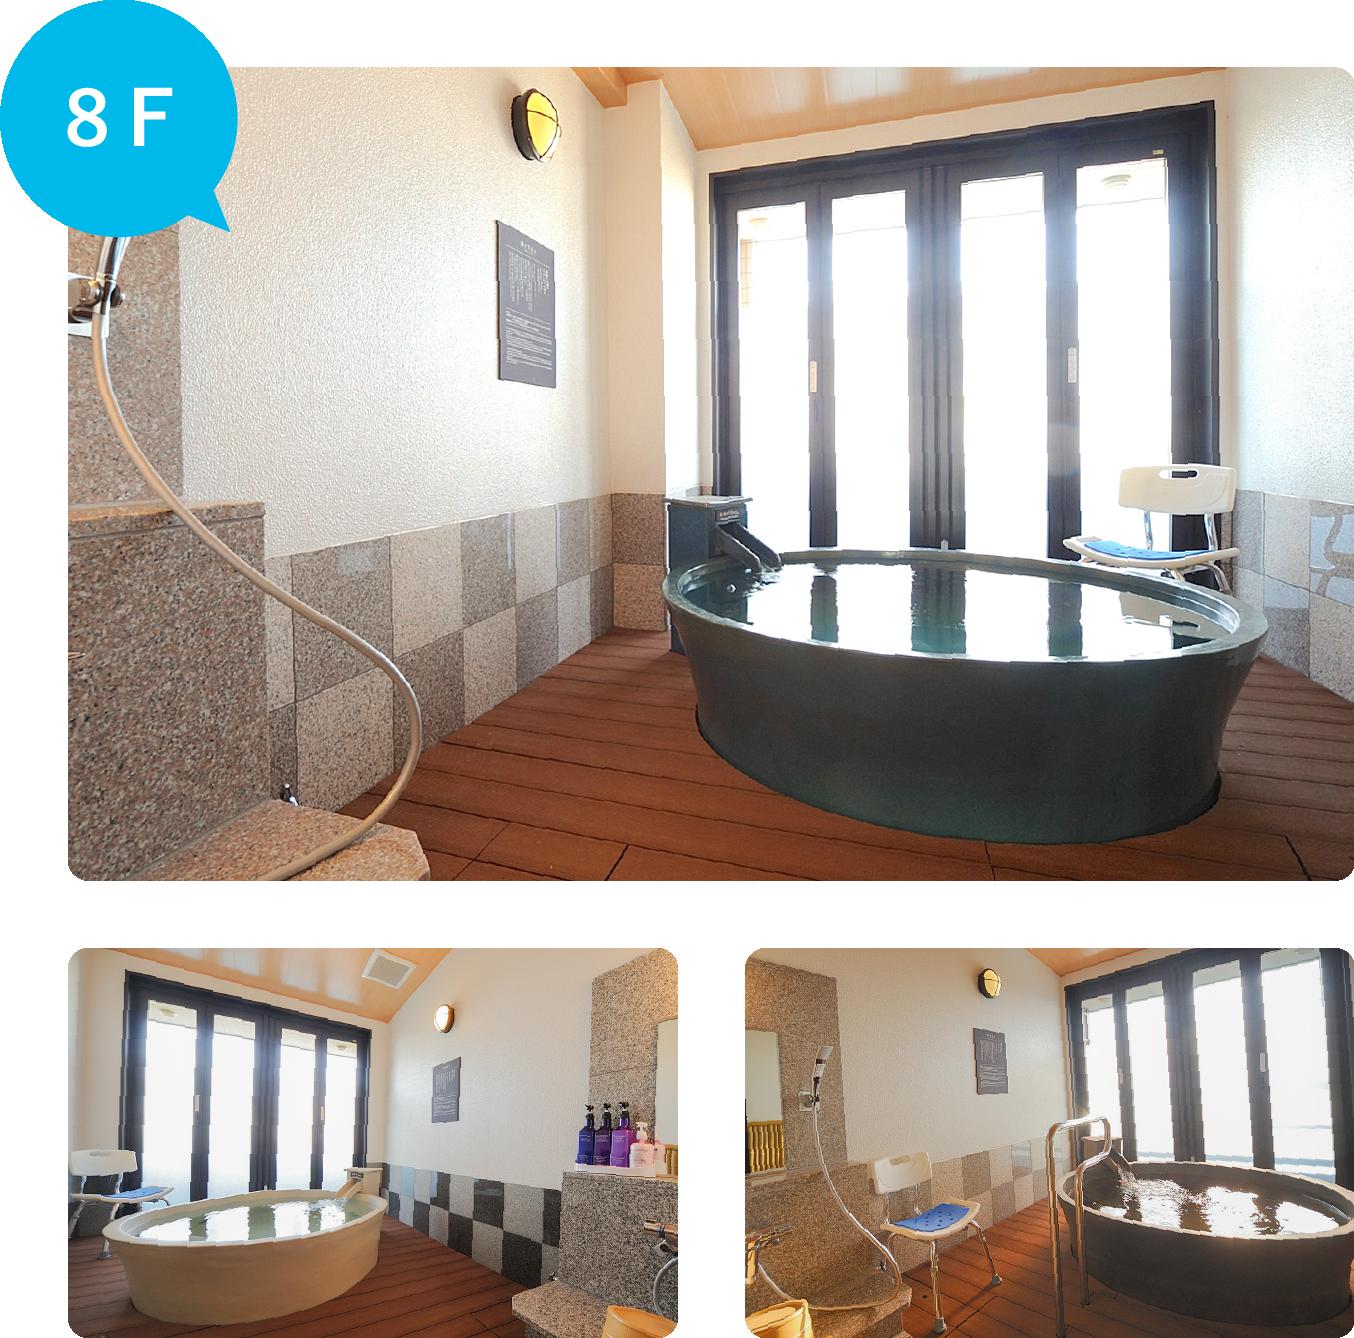 8F 貸切風呂